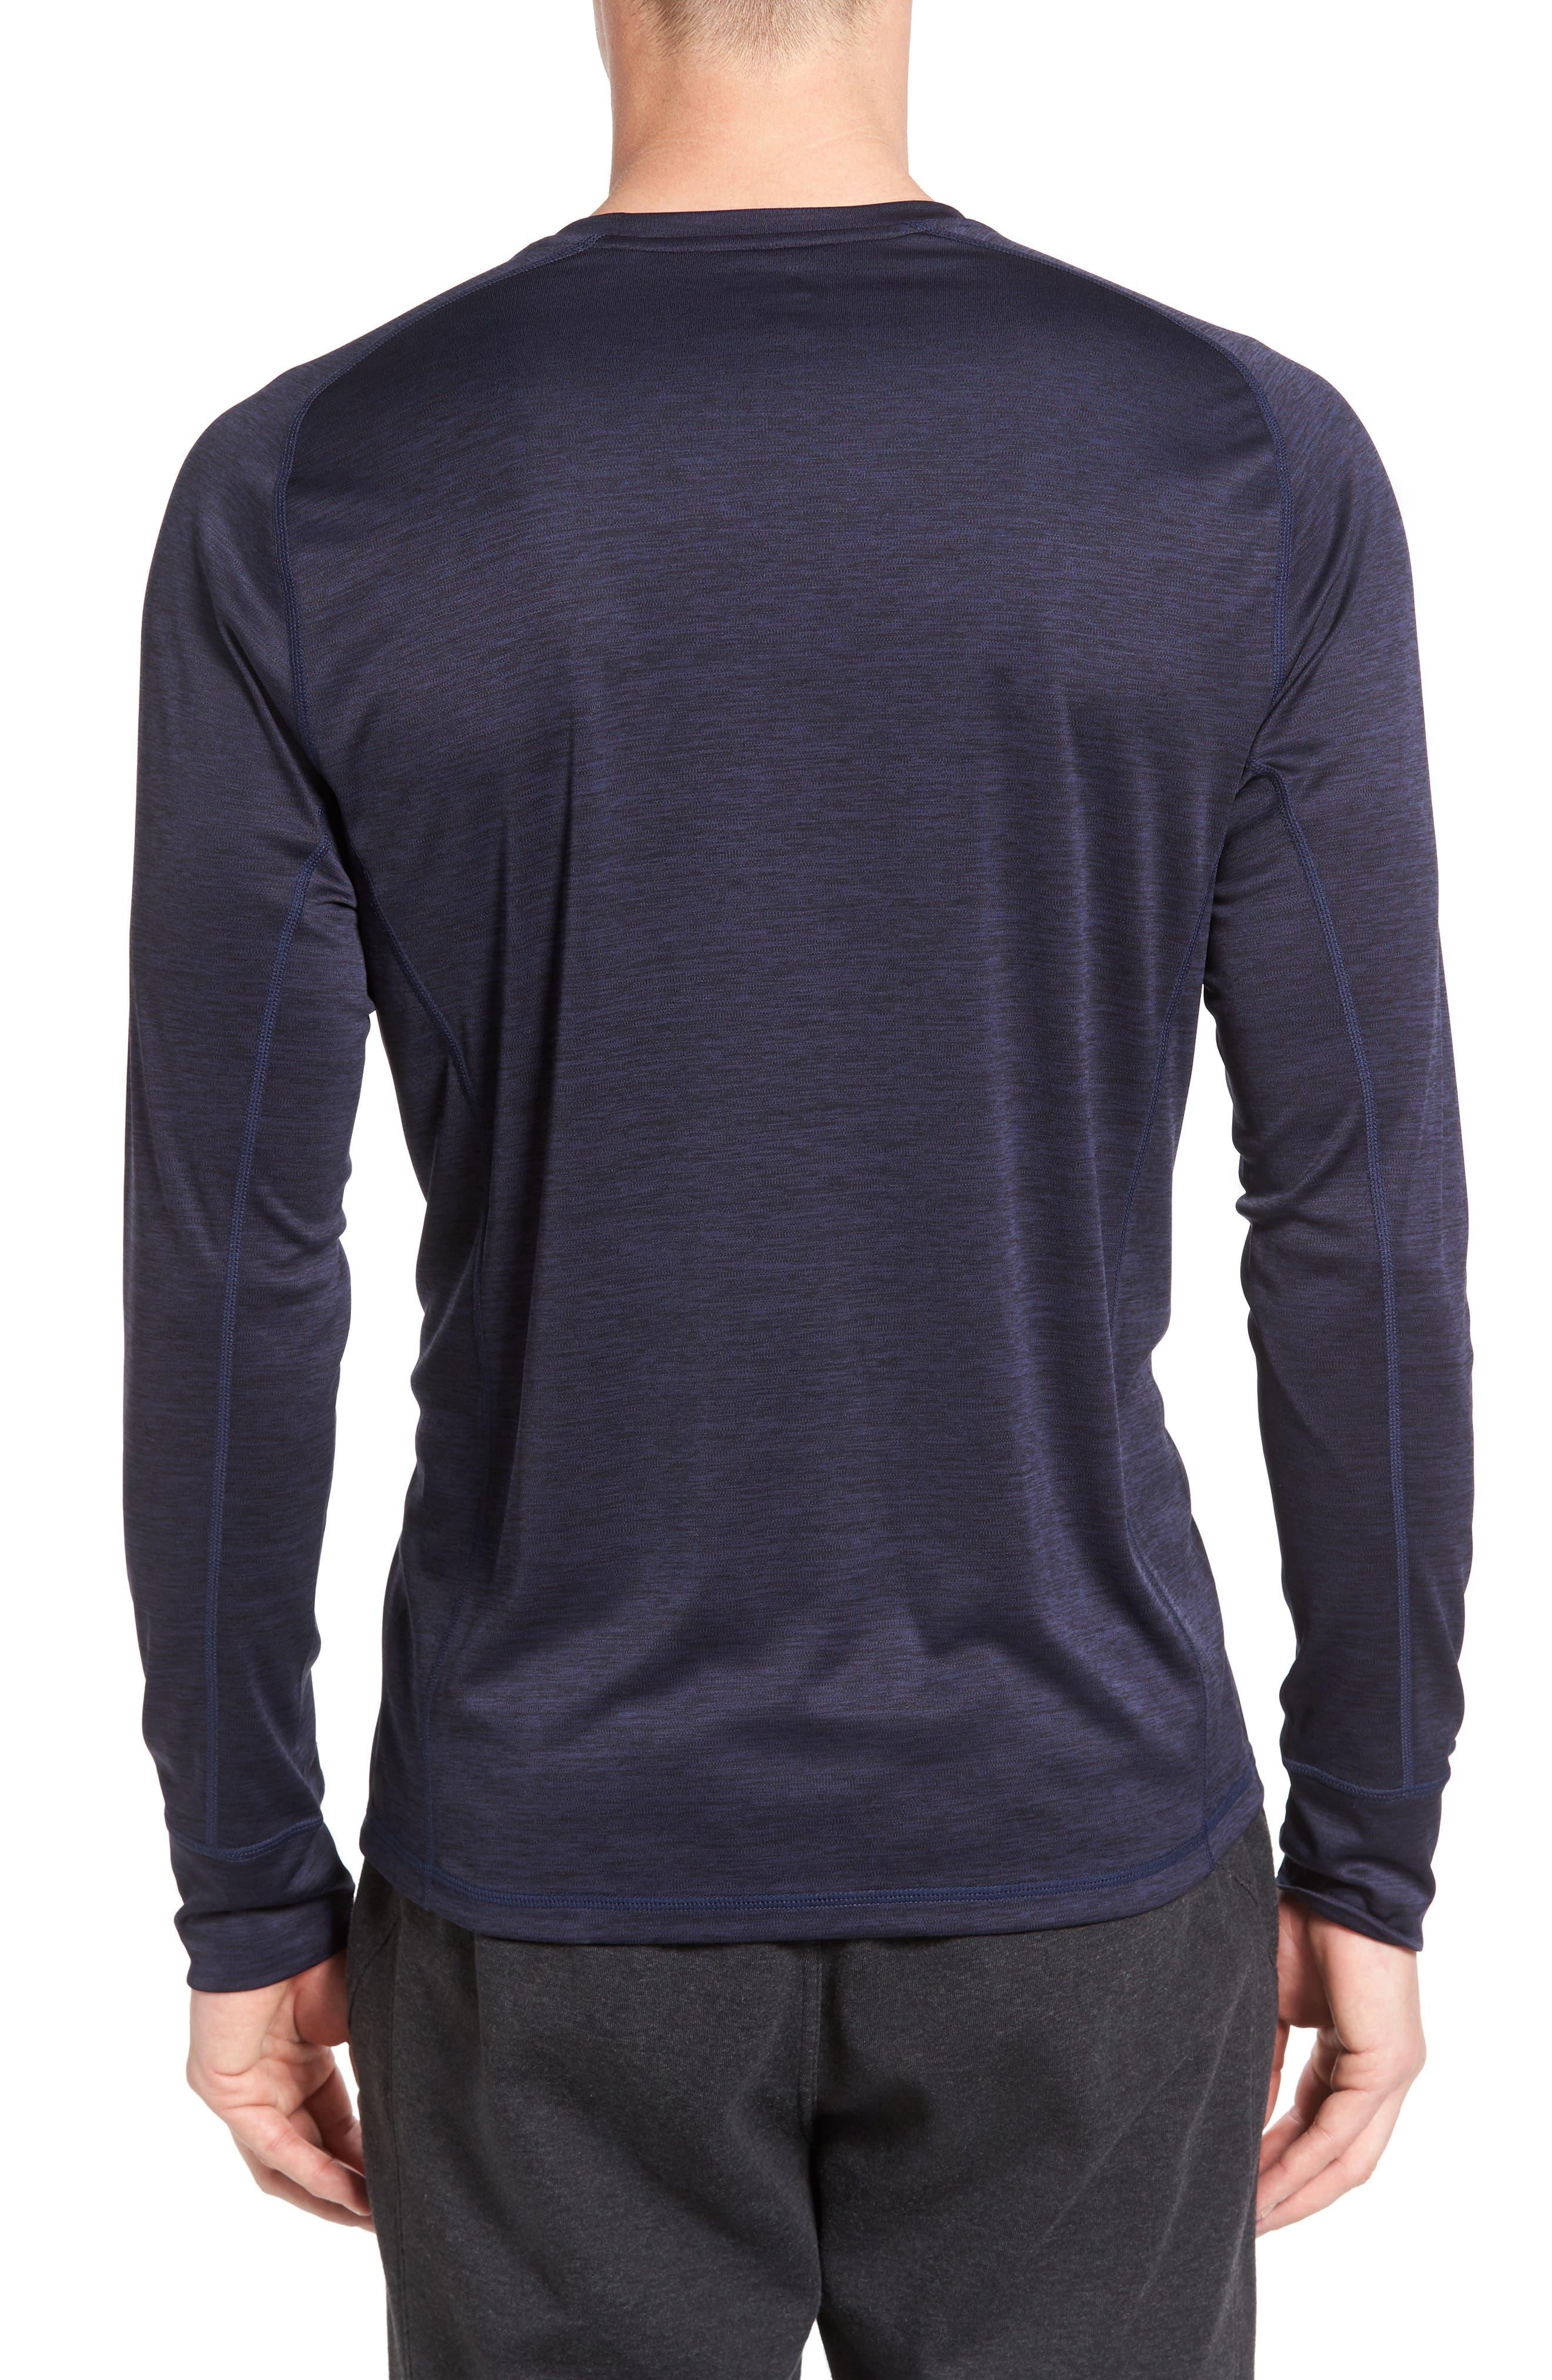 Alternate Image 2  - Zella Triplite Long Sleeve T-Shirt